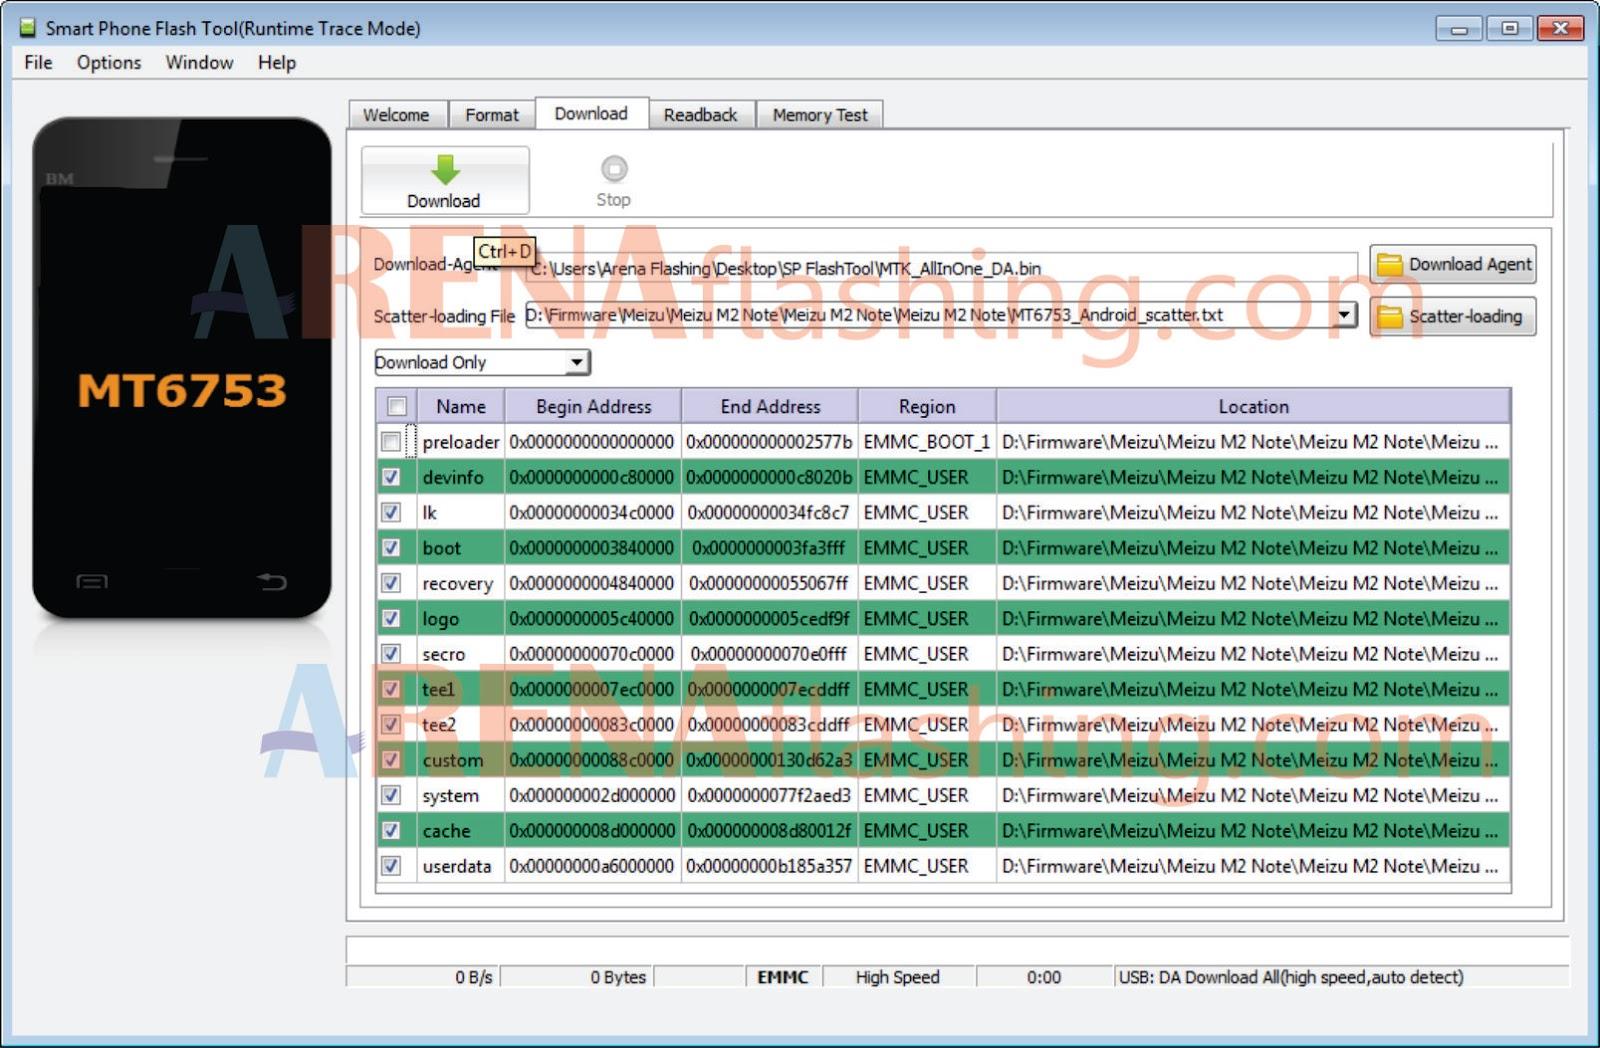 Cara Flash Meizu M2 Note Tested Berhasil 100% - Tutorial Flashing